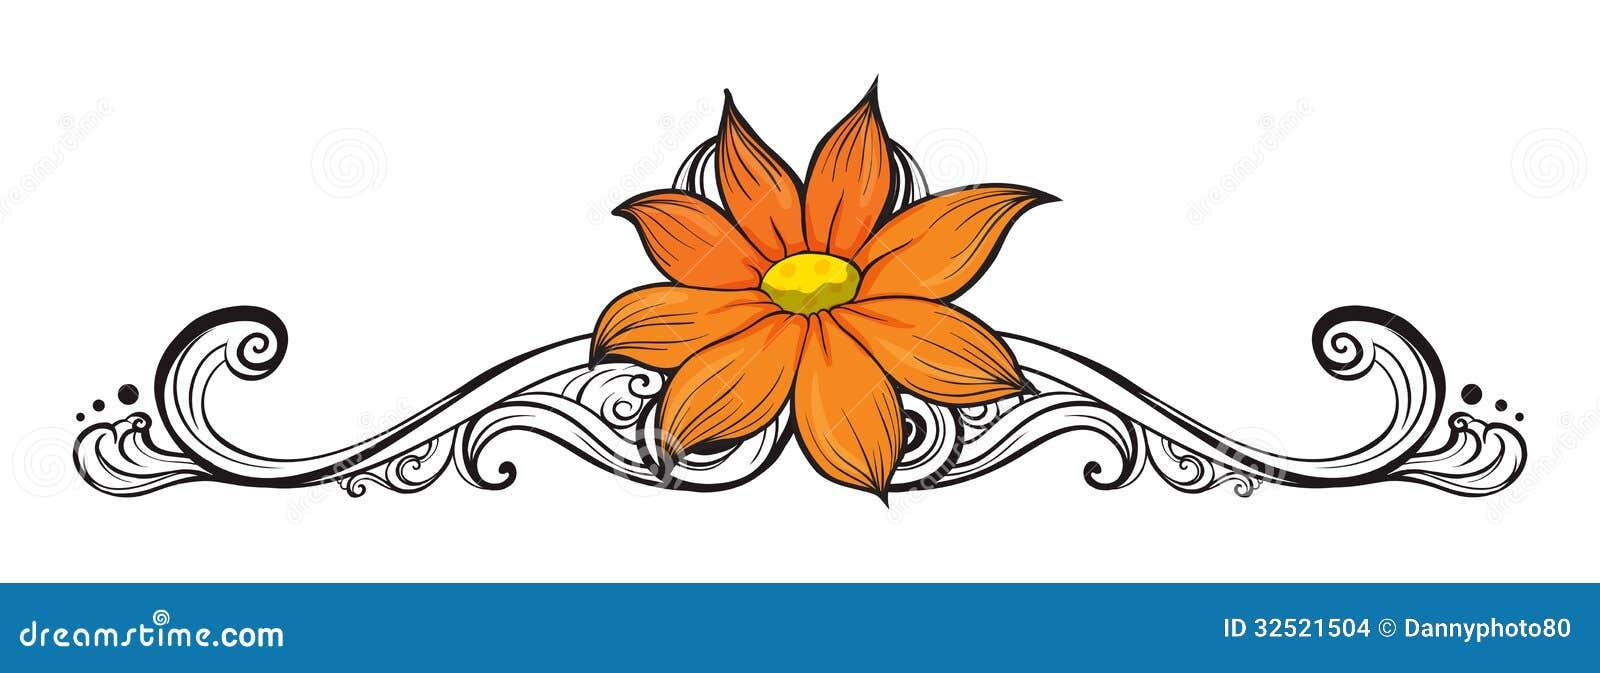 A simple flower border stock images image 32521504 for Illustration minimaliste